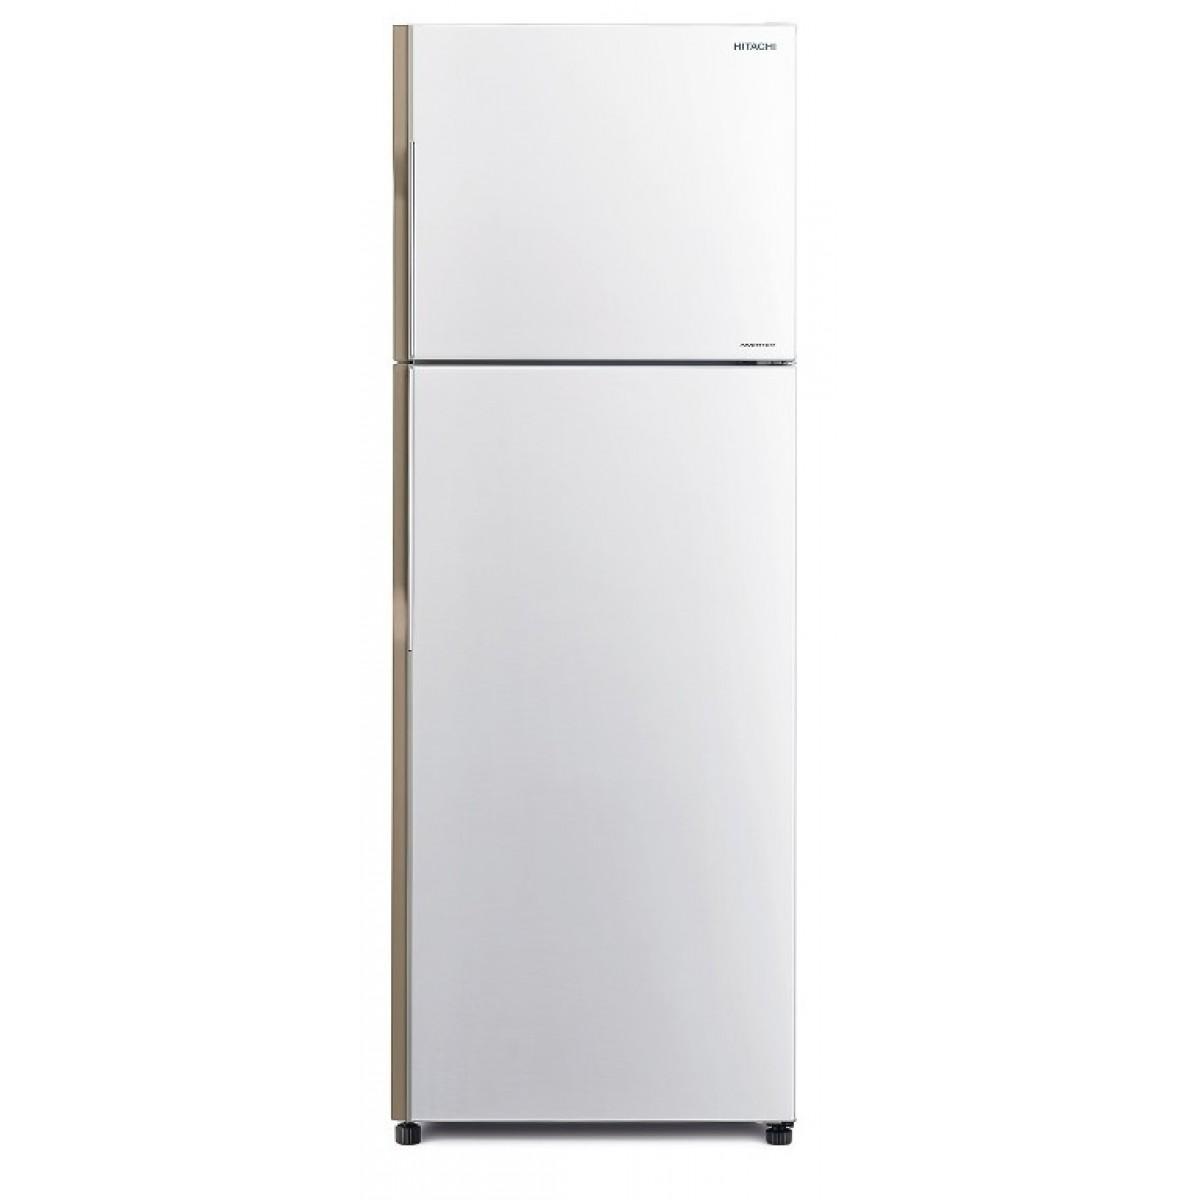 Hitachi Ψυγείο Δίπορτο NoFrost R-H350PRU7 PWH Ψυγεία δίπορτα